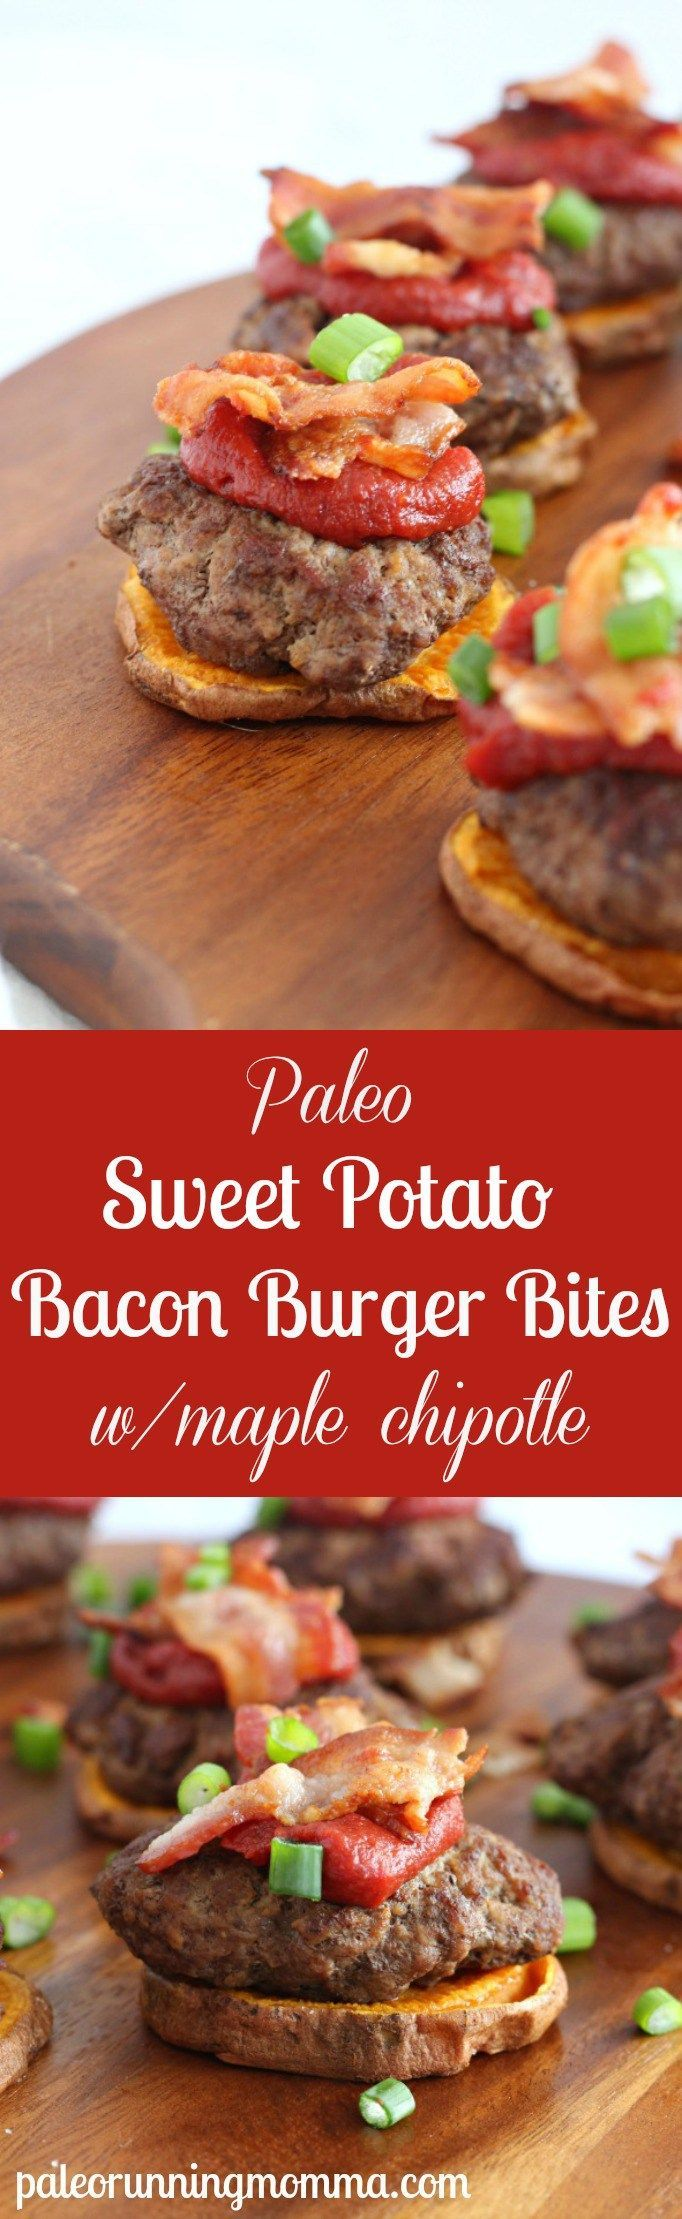 Paleo Sweet Potato Bacon Burger Bites with Maple Chipotle Ketchup - #grainfree…